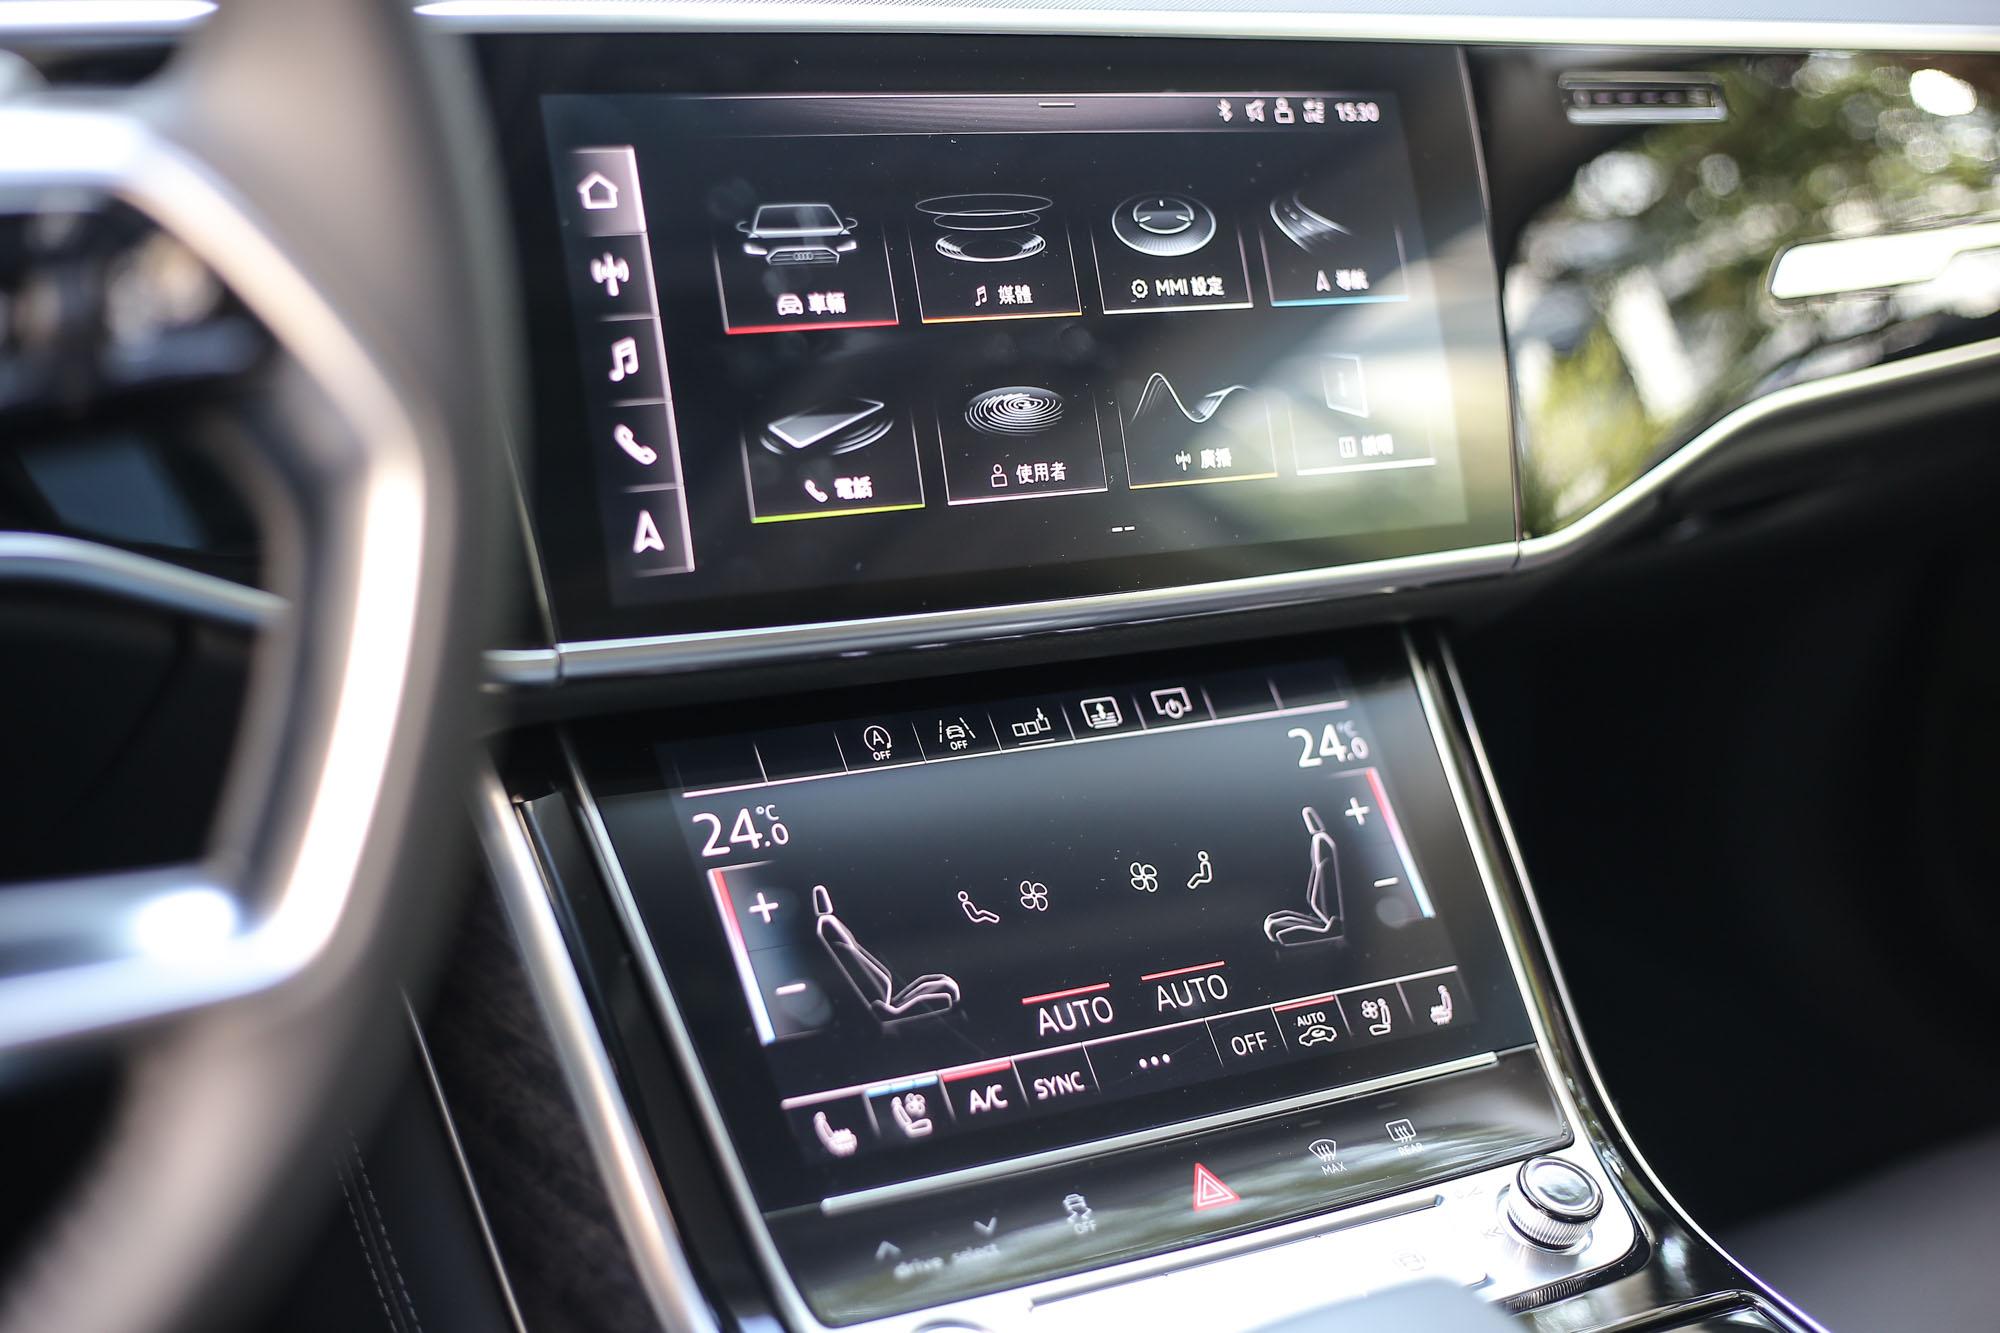 MMI touch response 直覺式觸控系統賦予中控臺兩具觸控螢幕。